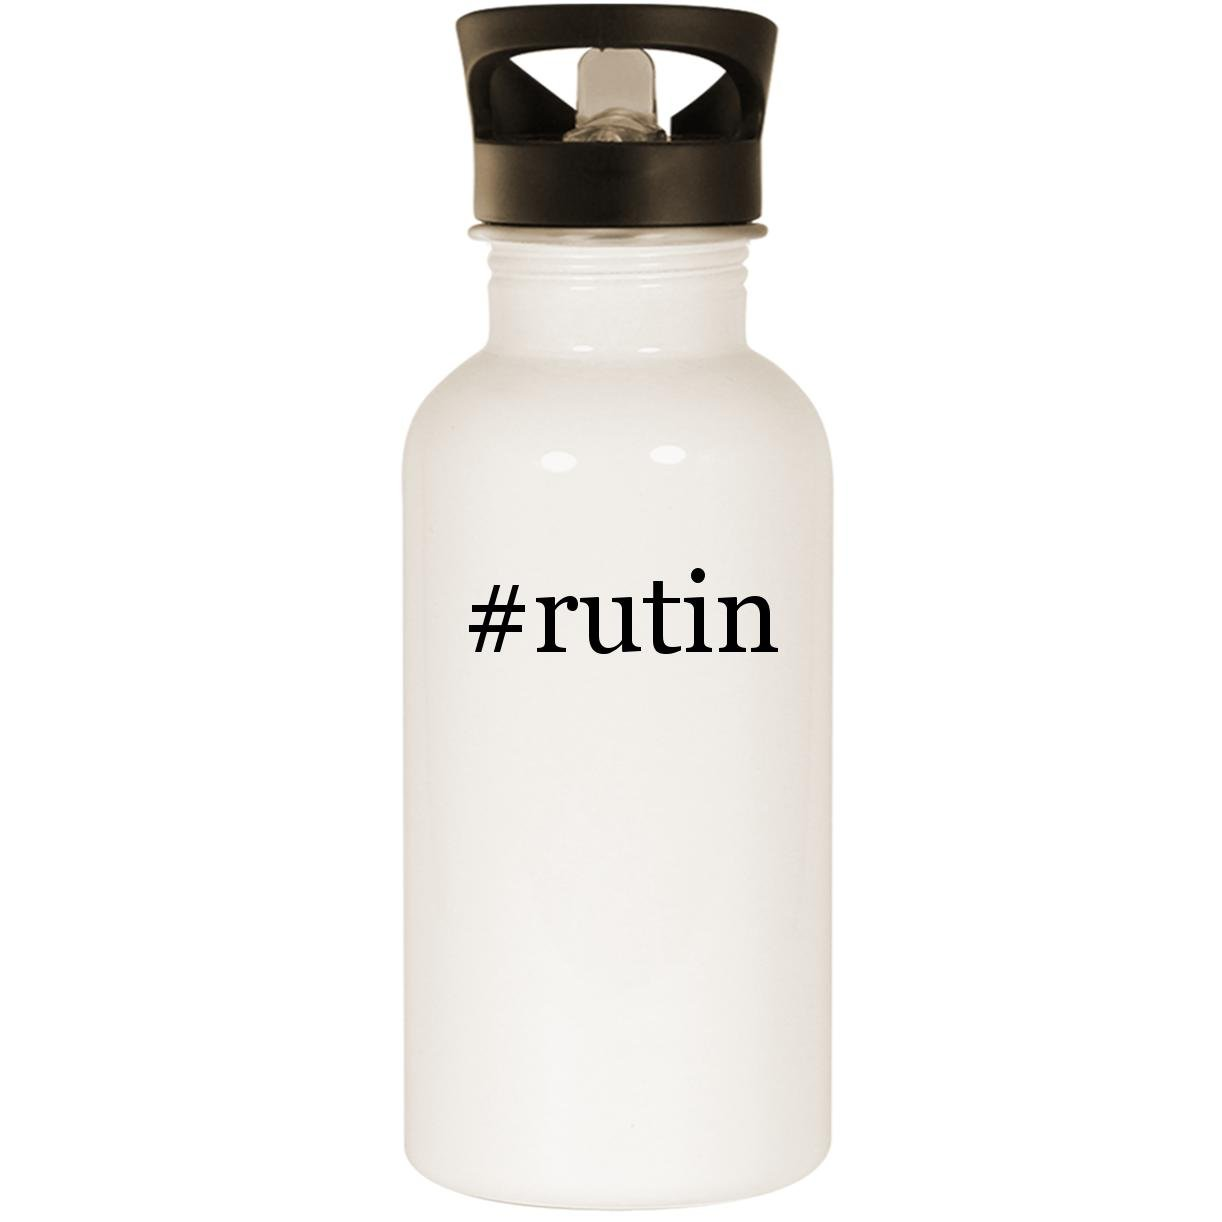 # Rutin – ステンレススチール20oz Road Ready水ボトル ホワイト US-C-07-18-02-049572-04-26-19-26 B07FTHKPXF ホワイト